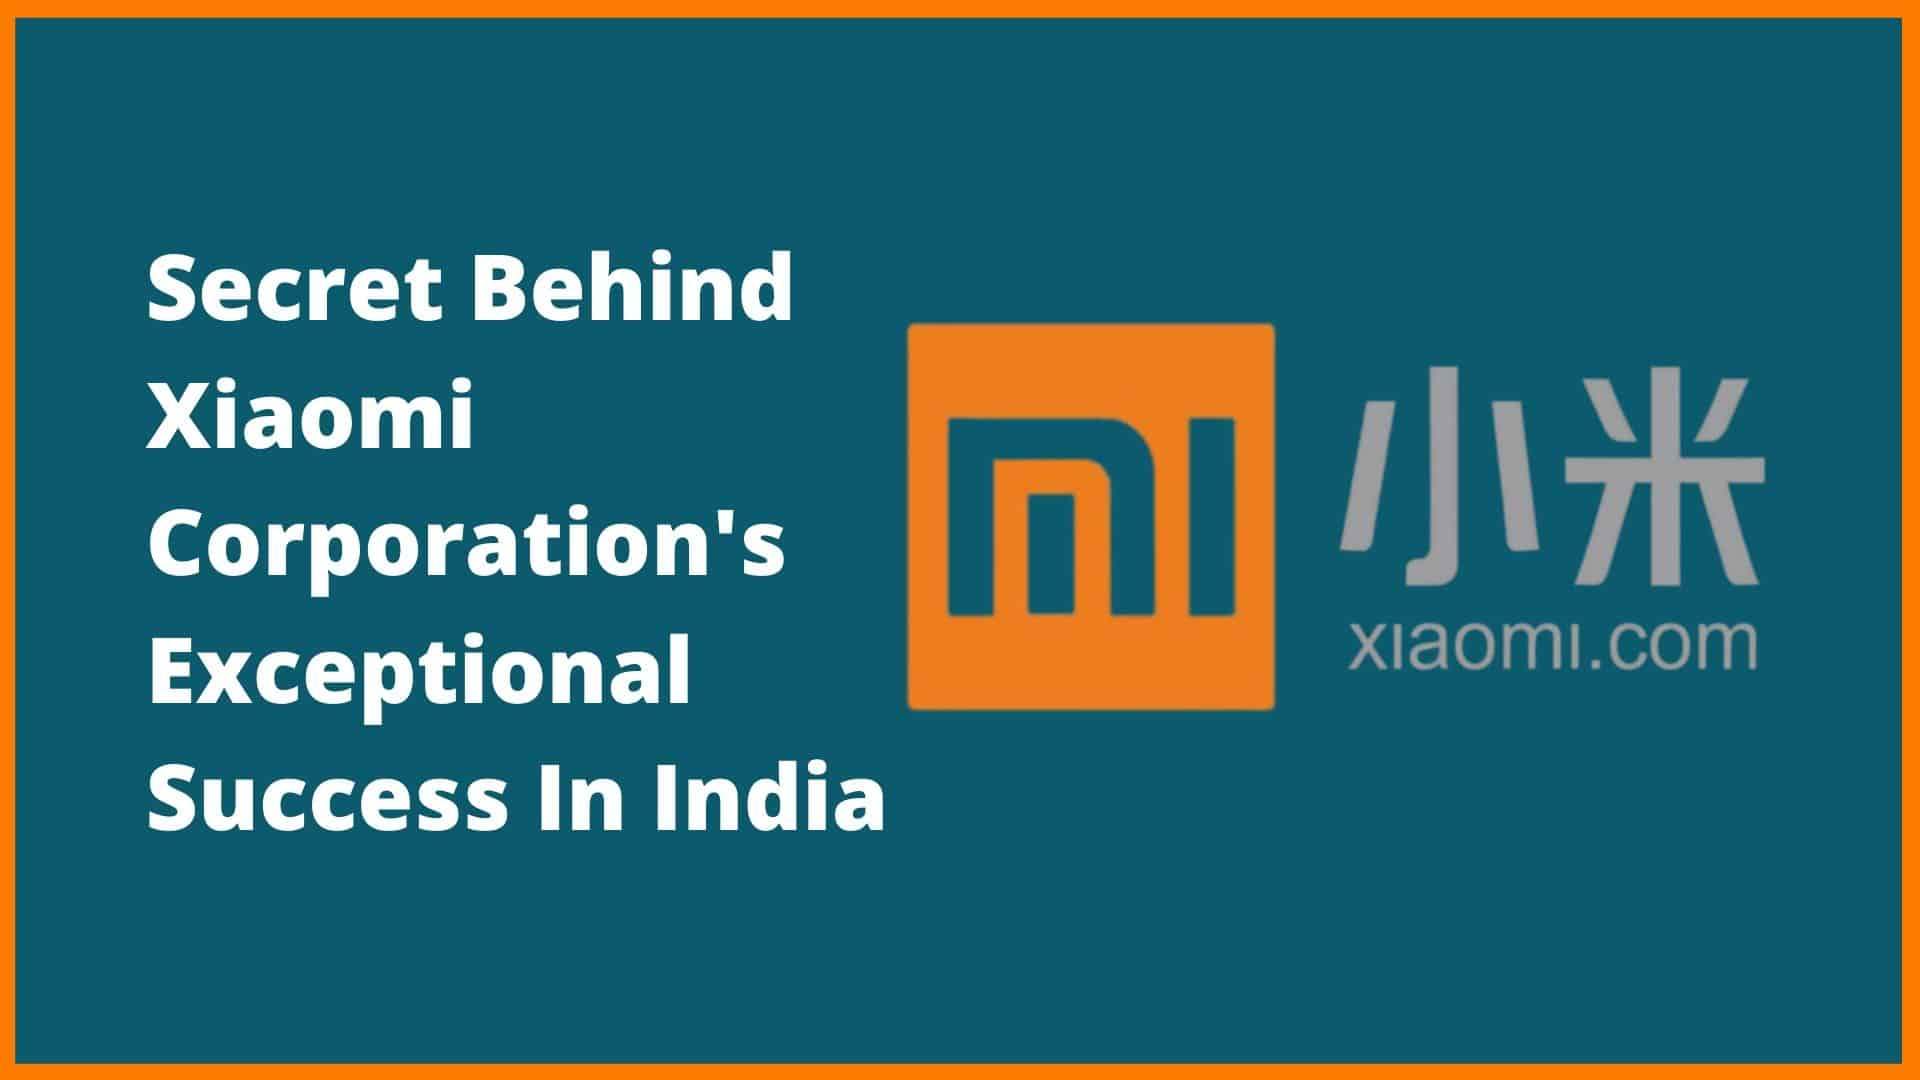 Secret Behind Xiaomi's Success In India [Xiaomi Case Study]